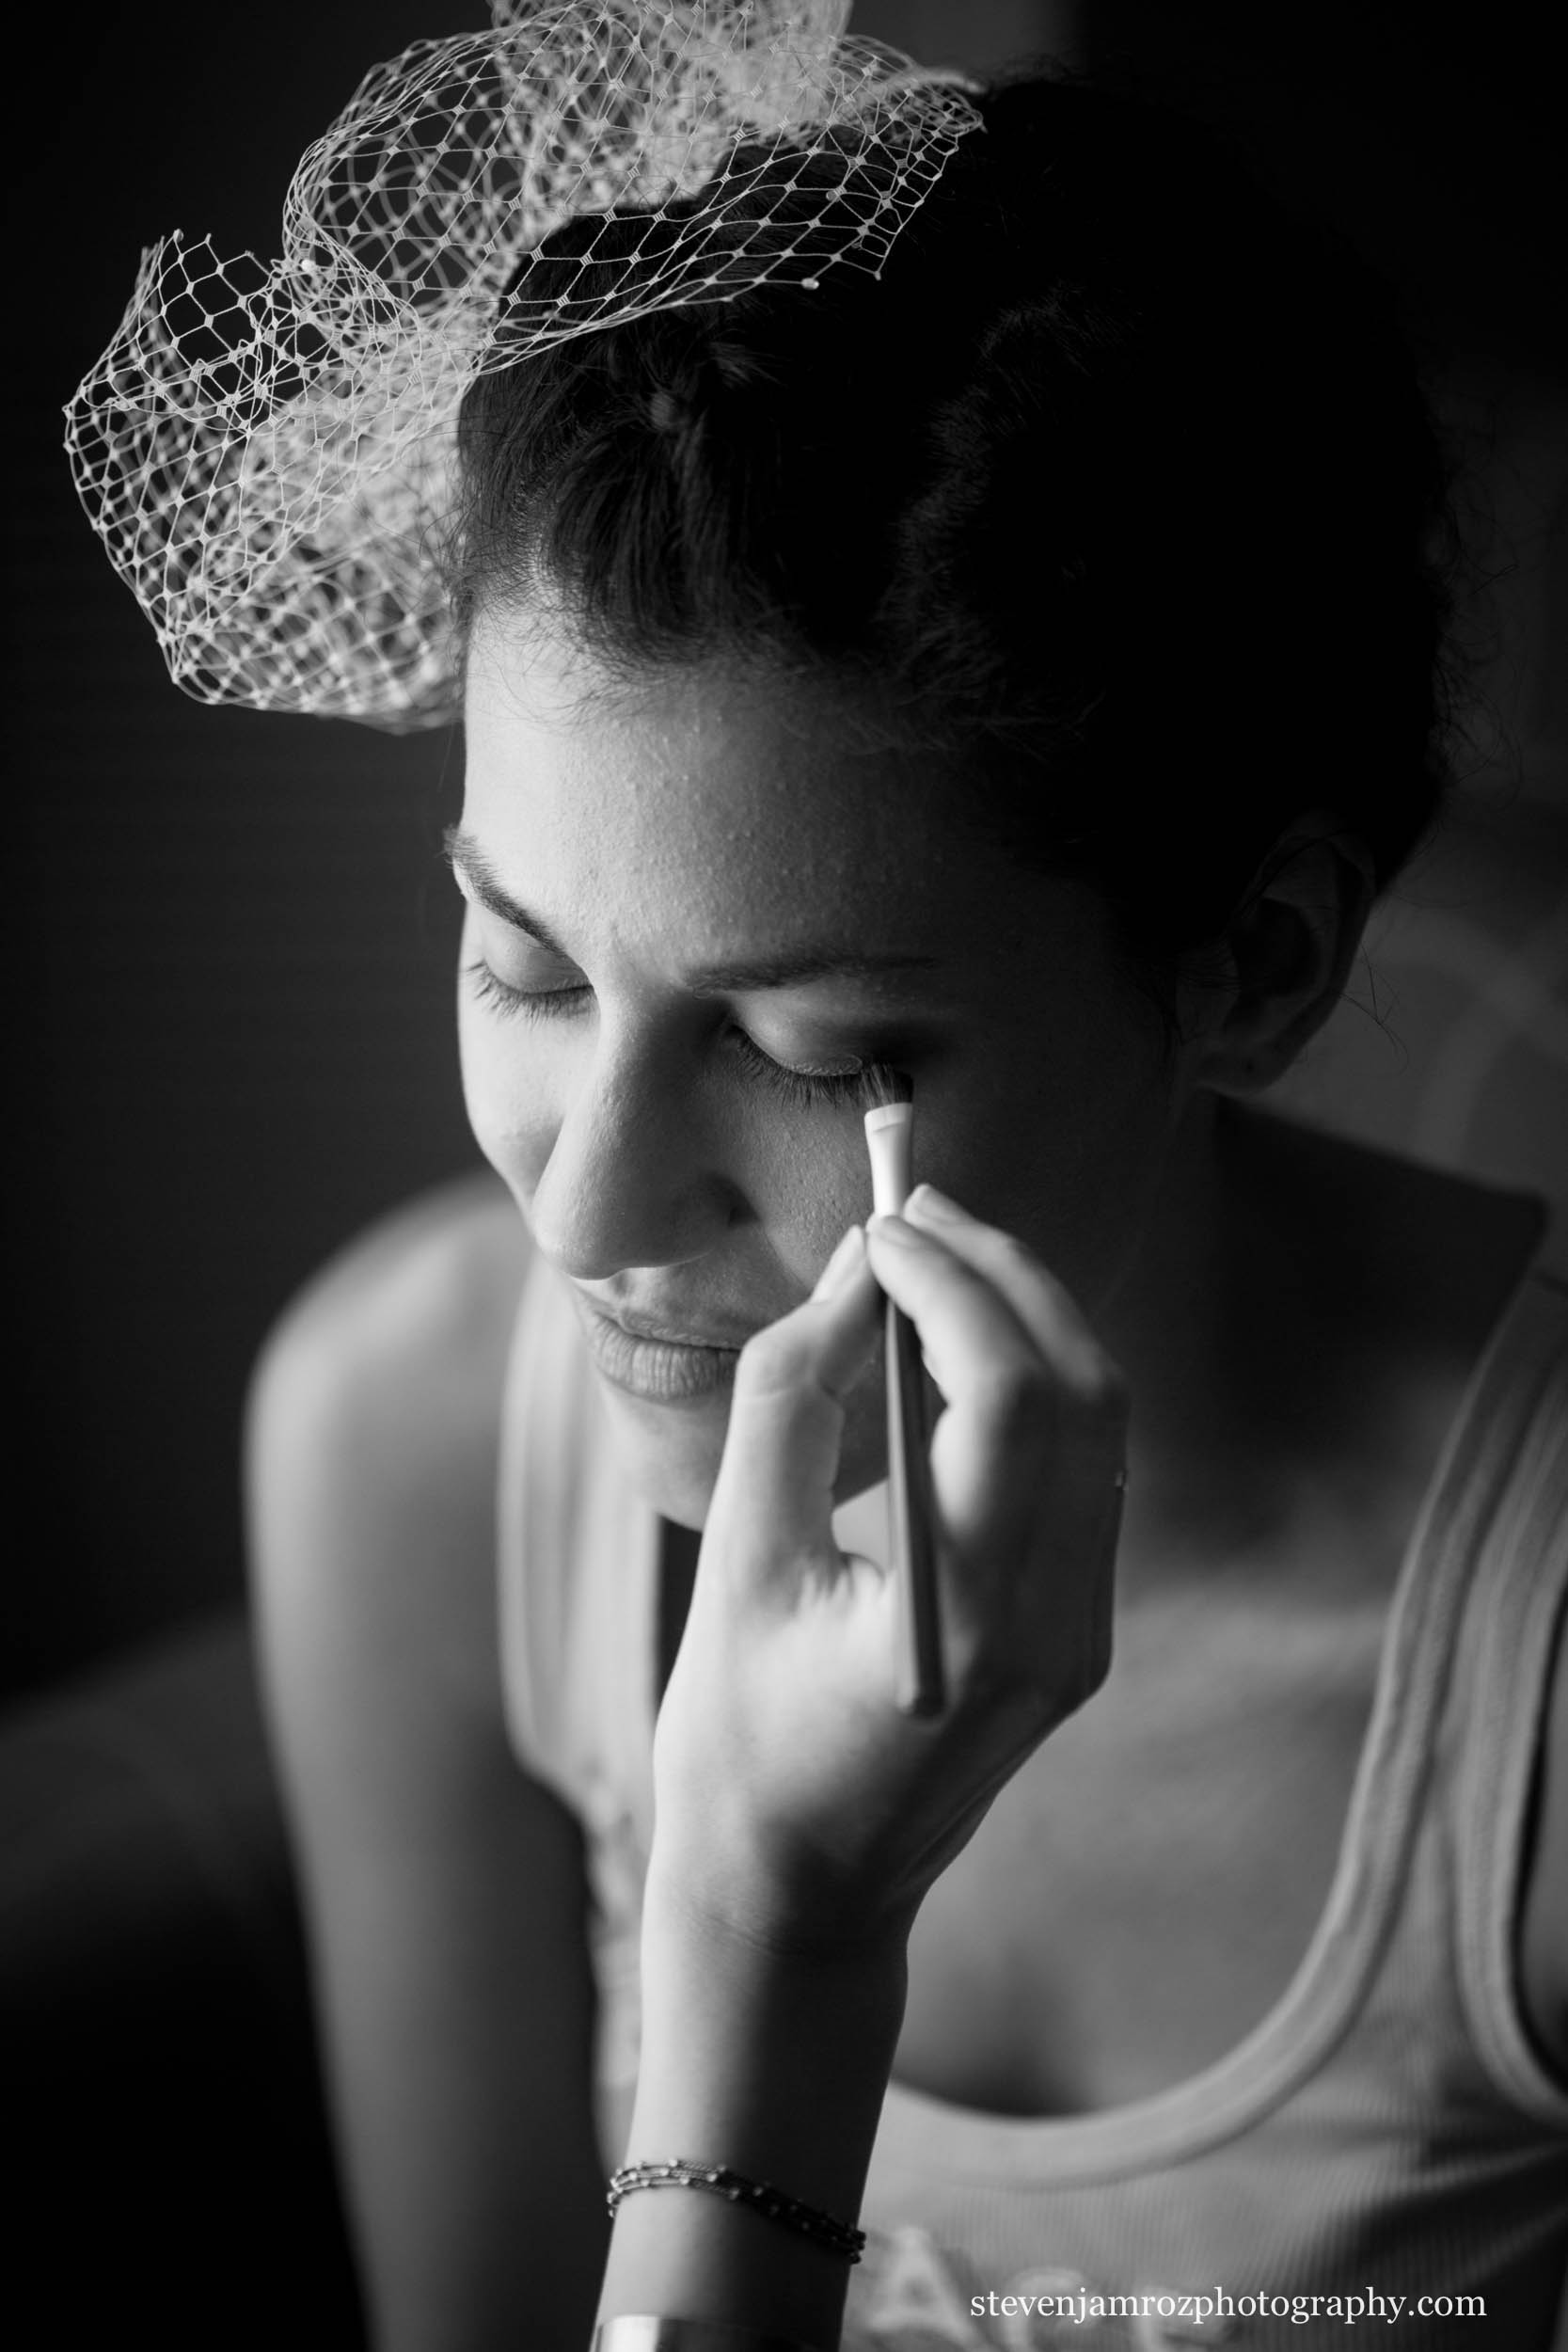 getting-makeup-applied-bride-steven-jamroz-photography-0162.jpg